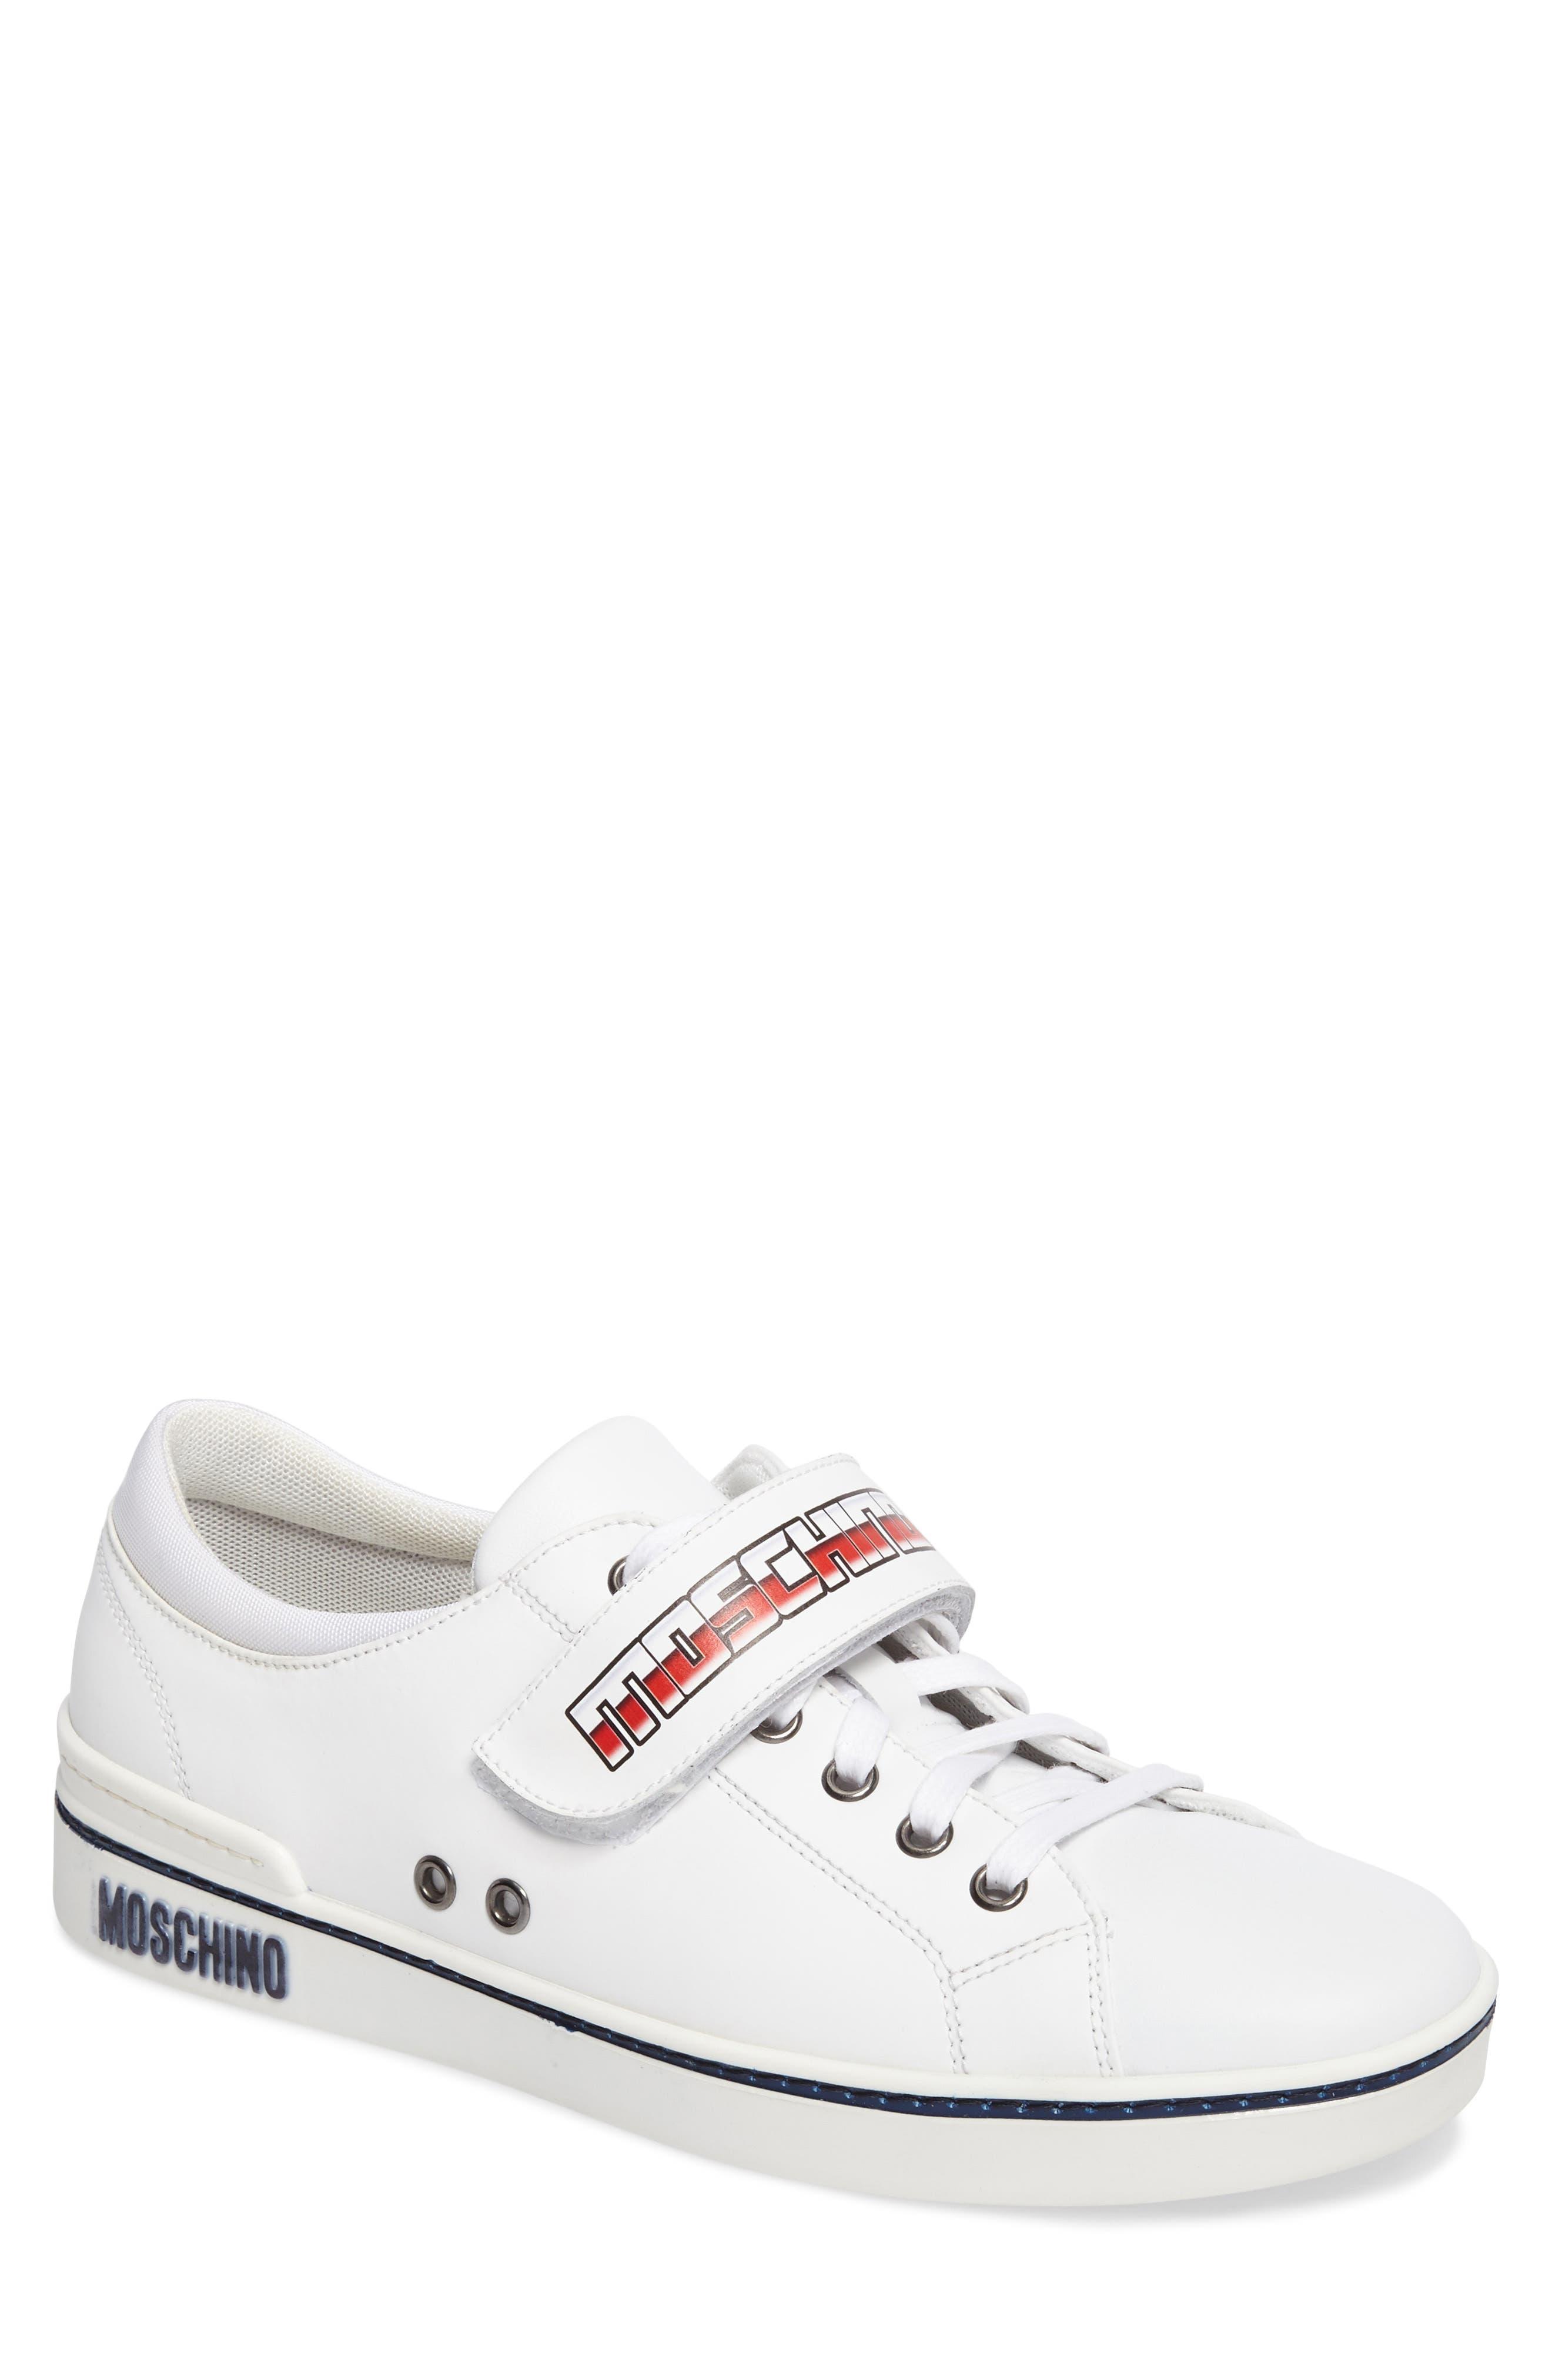 Moschino Strap Sneaker (Men)